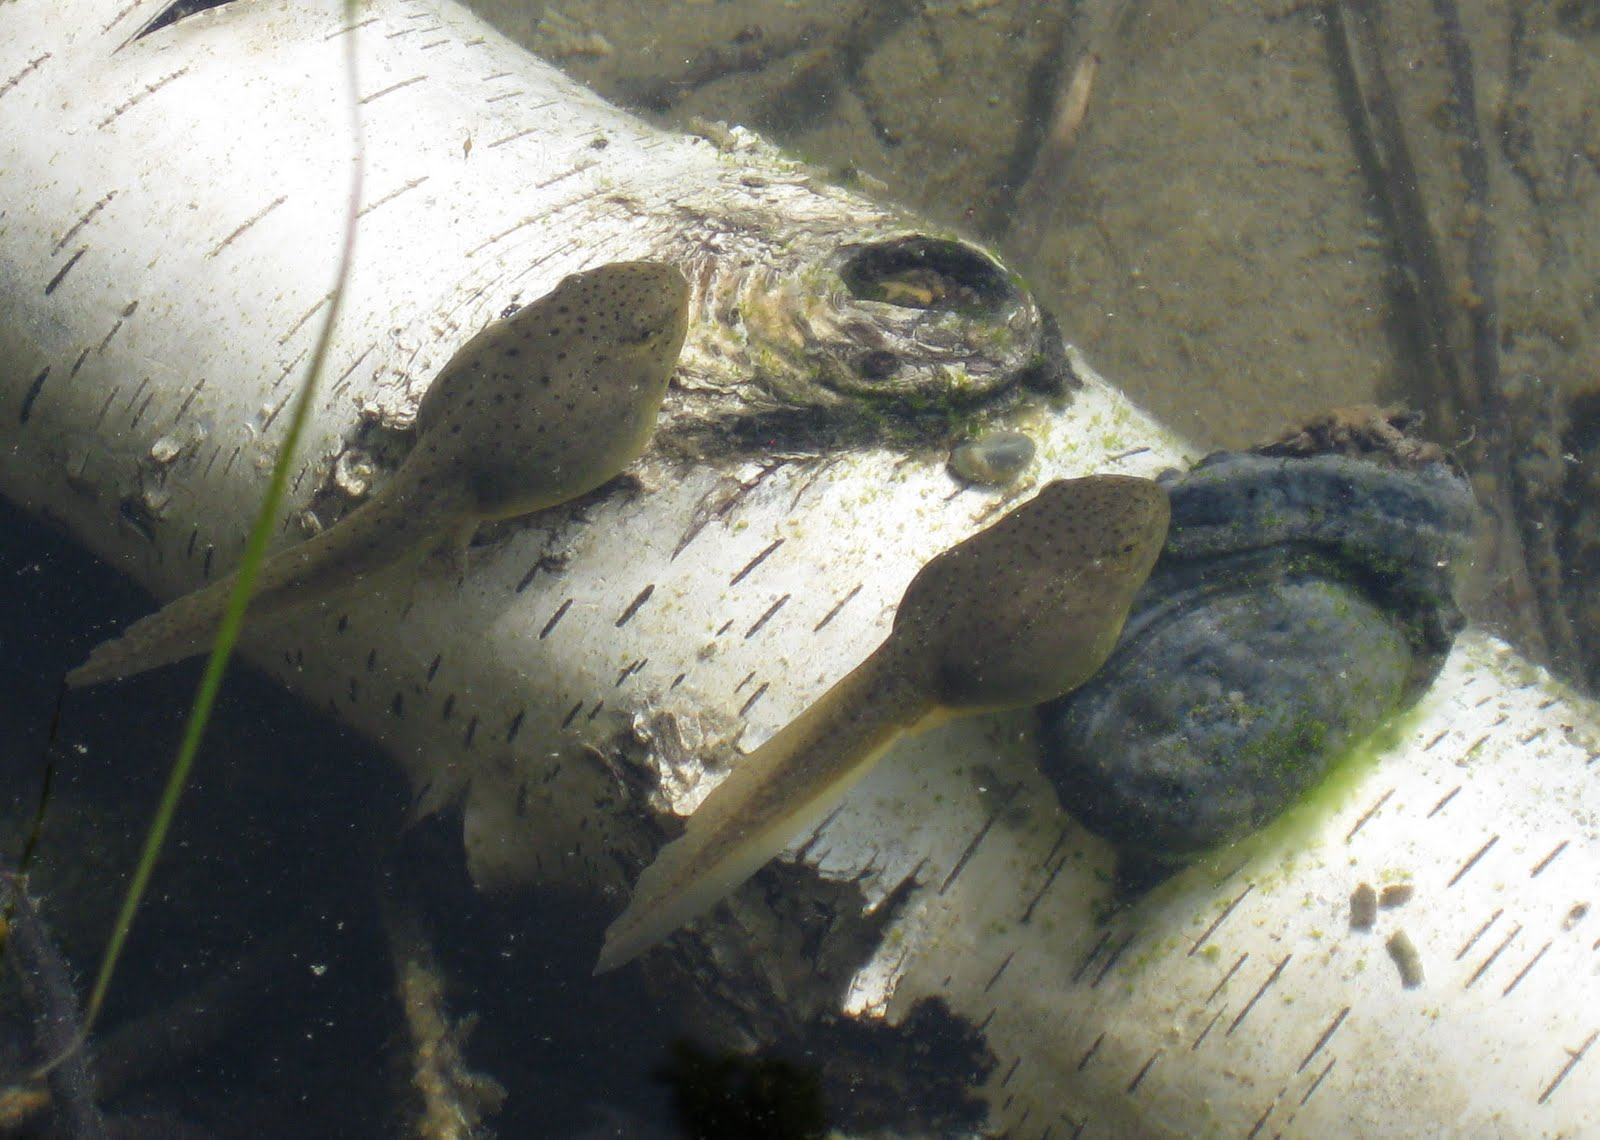 http://2.bp.blogspot.com/_2JaekKJlwgI/S_haOKIf0GI/AAAAAAAACiw/dMeacBMRUS4/s1600/tadpoles-4b-sm.jpg